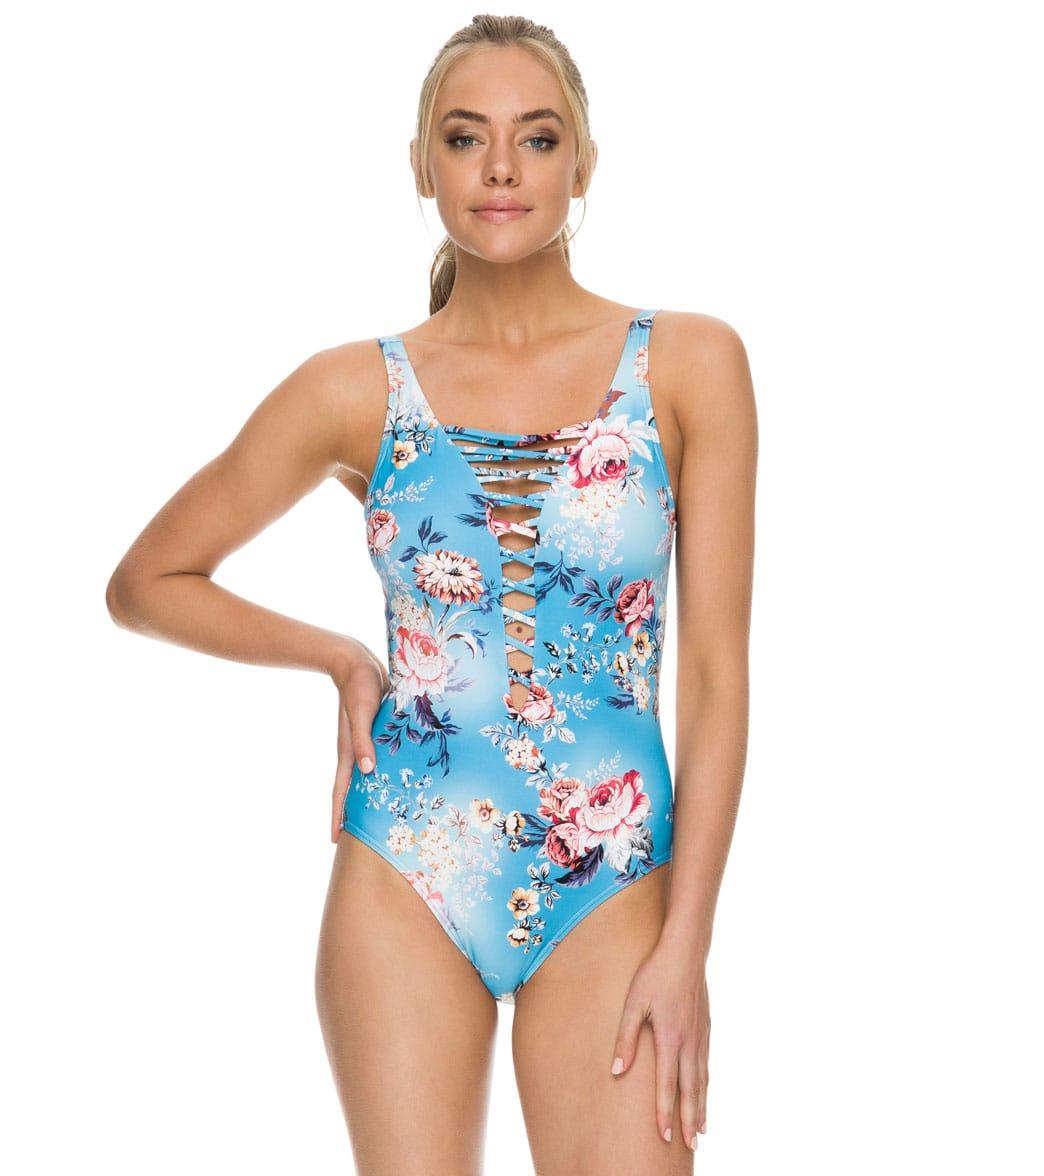 Azura Portabello Lace Up Highneck One Piece Swimsuit